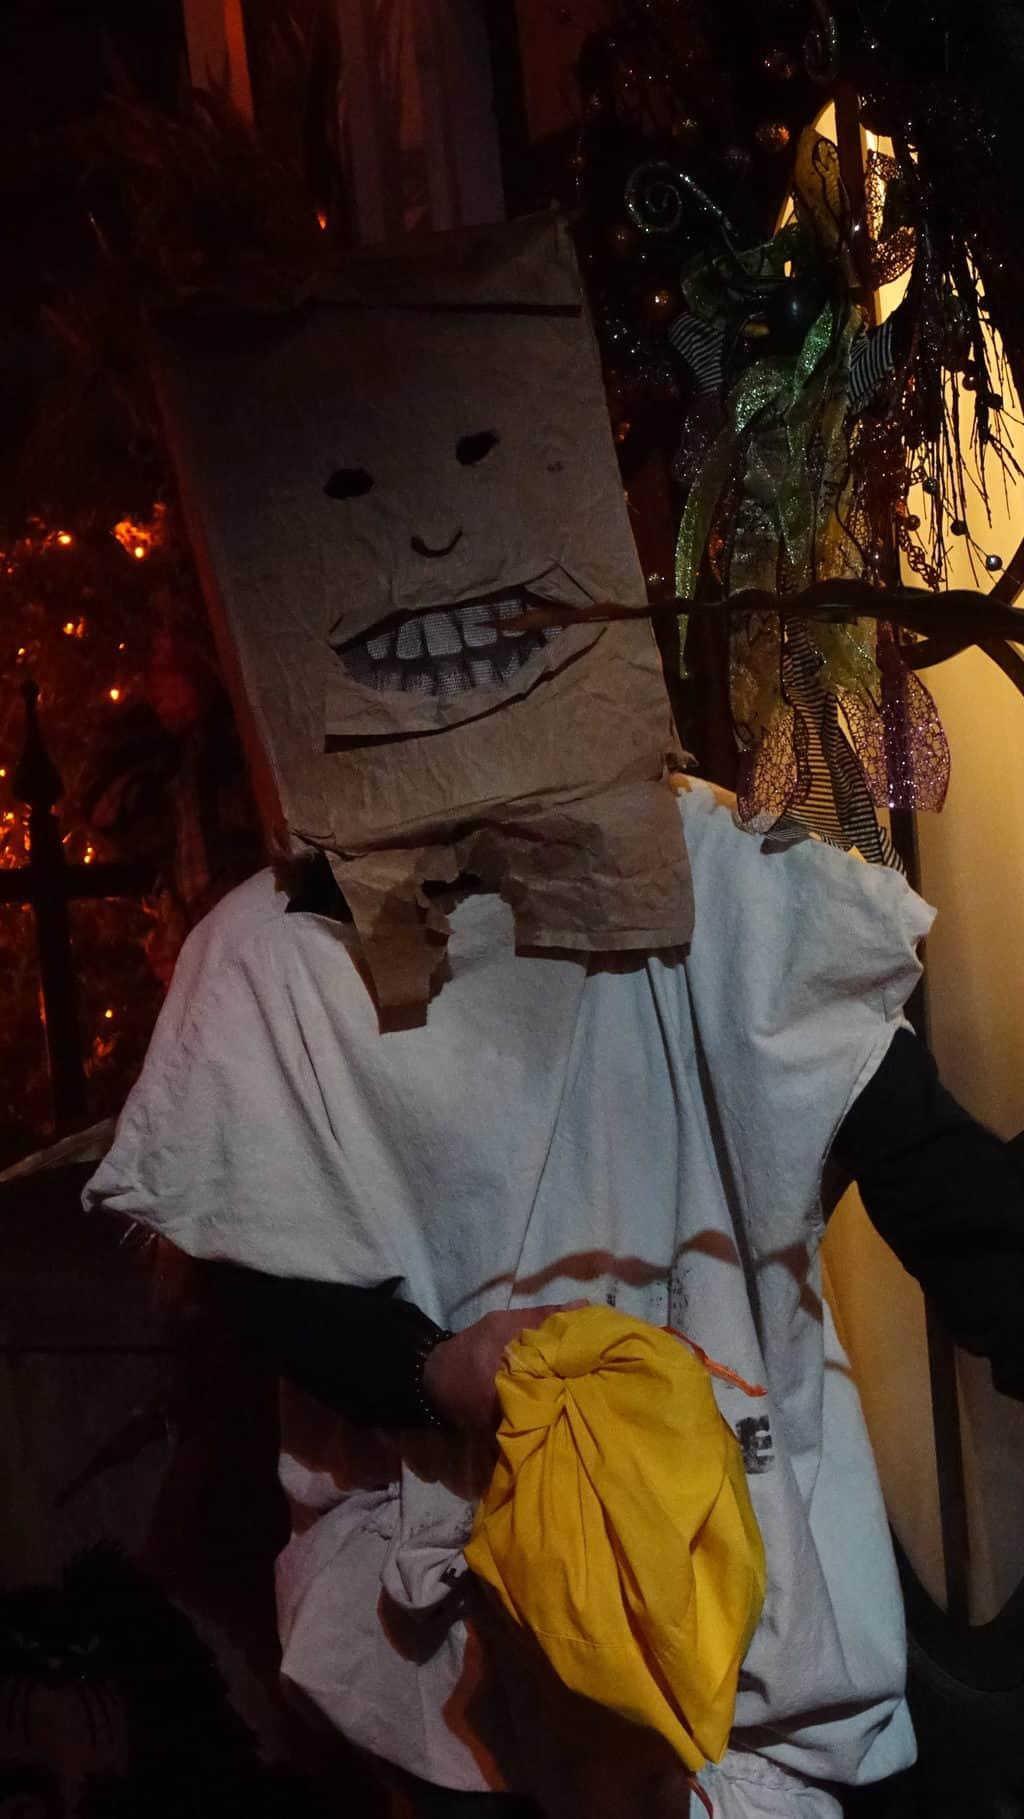 Universal Orland Halloween Horror Nights Scare Zones 40